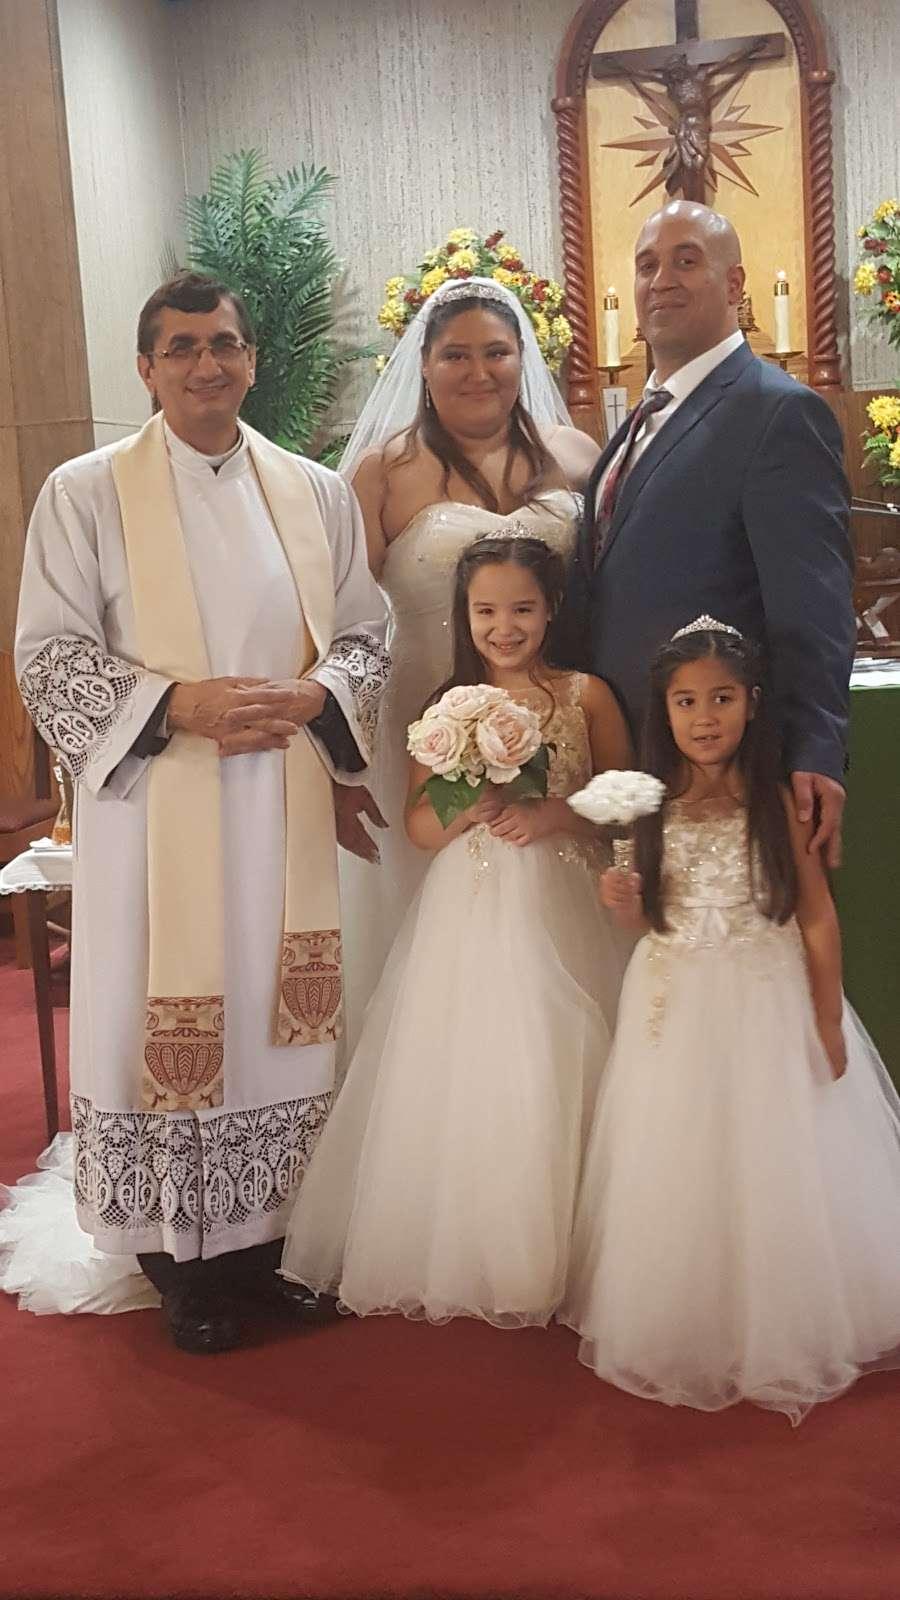 Holy Family Roman Catholic Church - church  | Photo 8 of 9 | Address: 210 Monroe St, Linden, NJ 07036, USA | Phone: (908) 862-1060